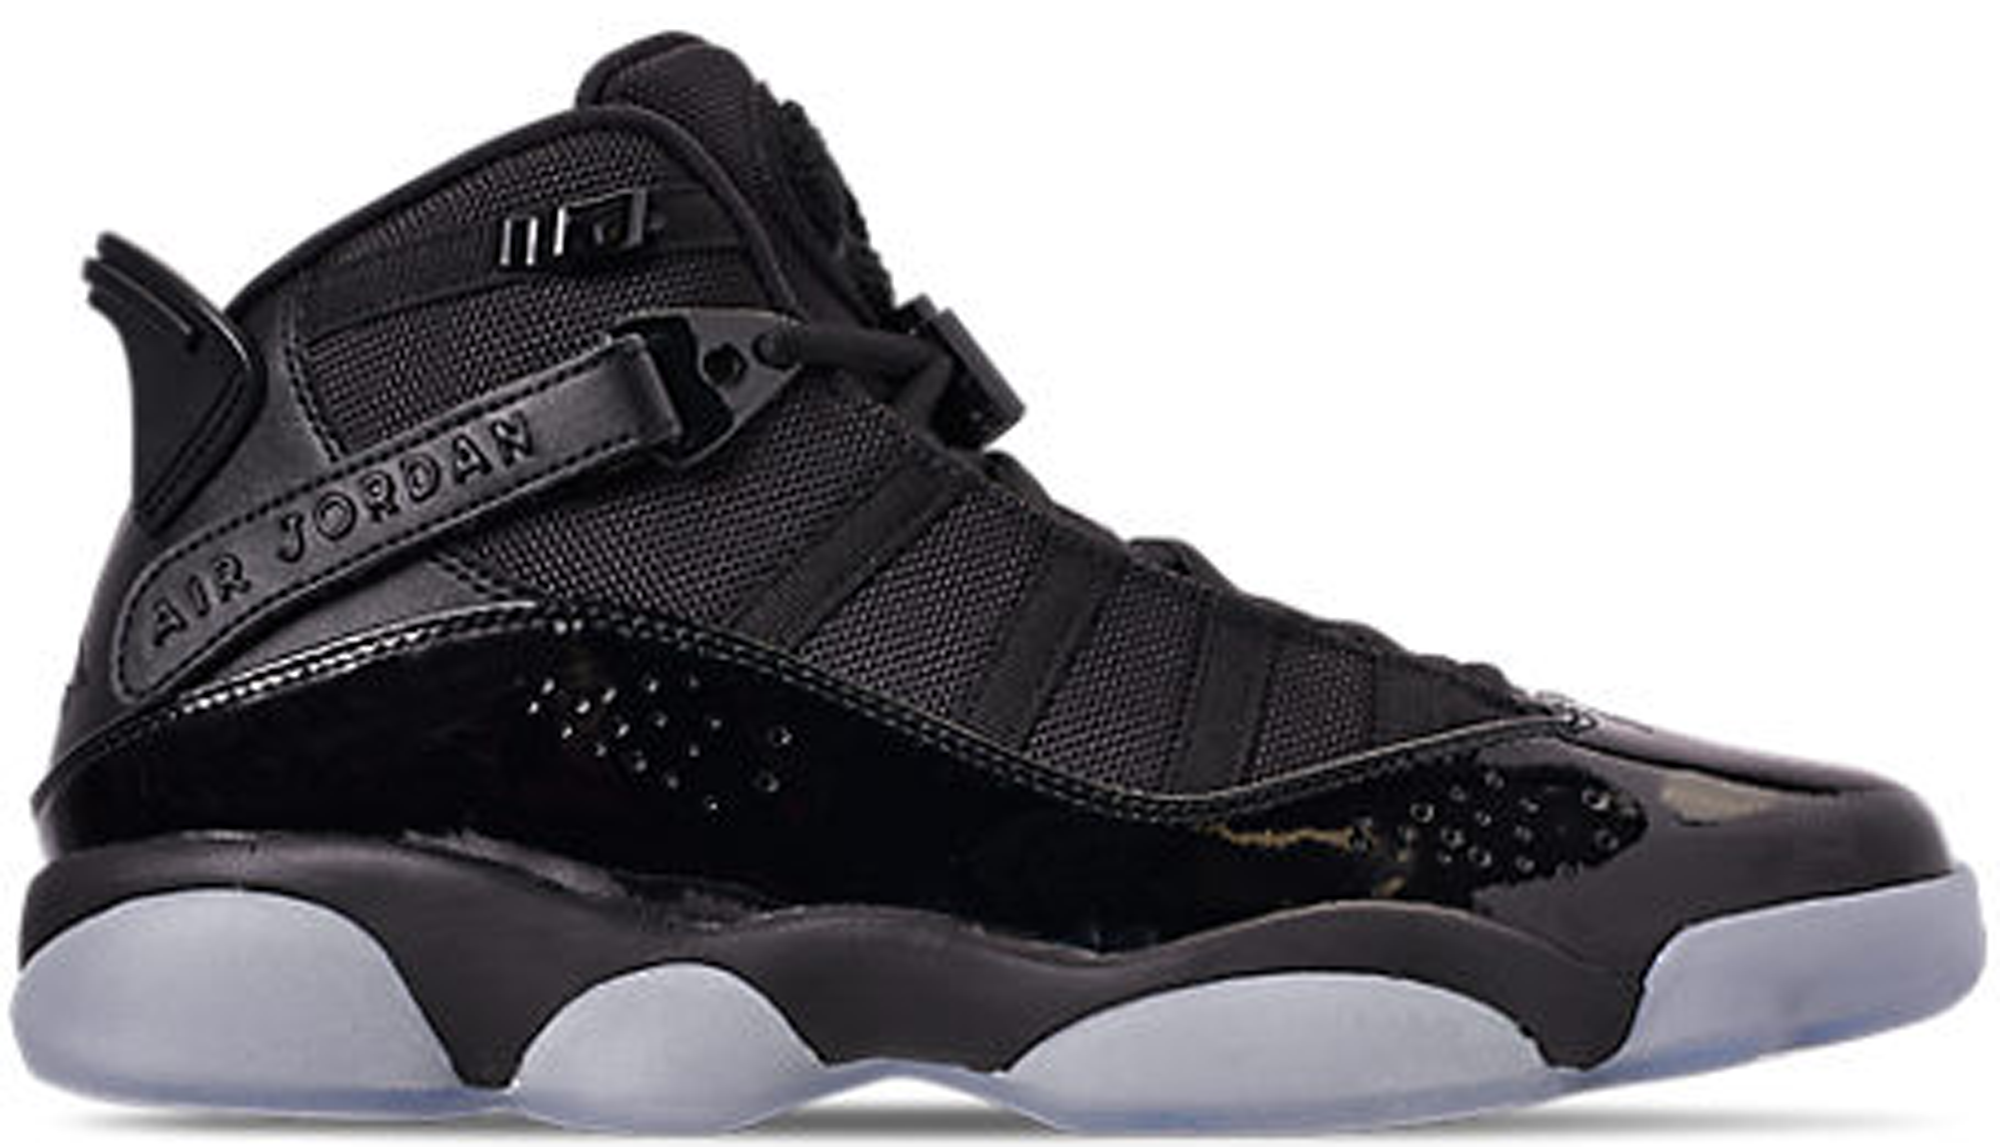 Jordan 6 Rings Black Ice